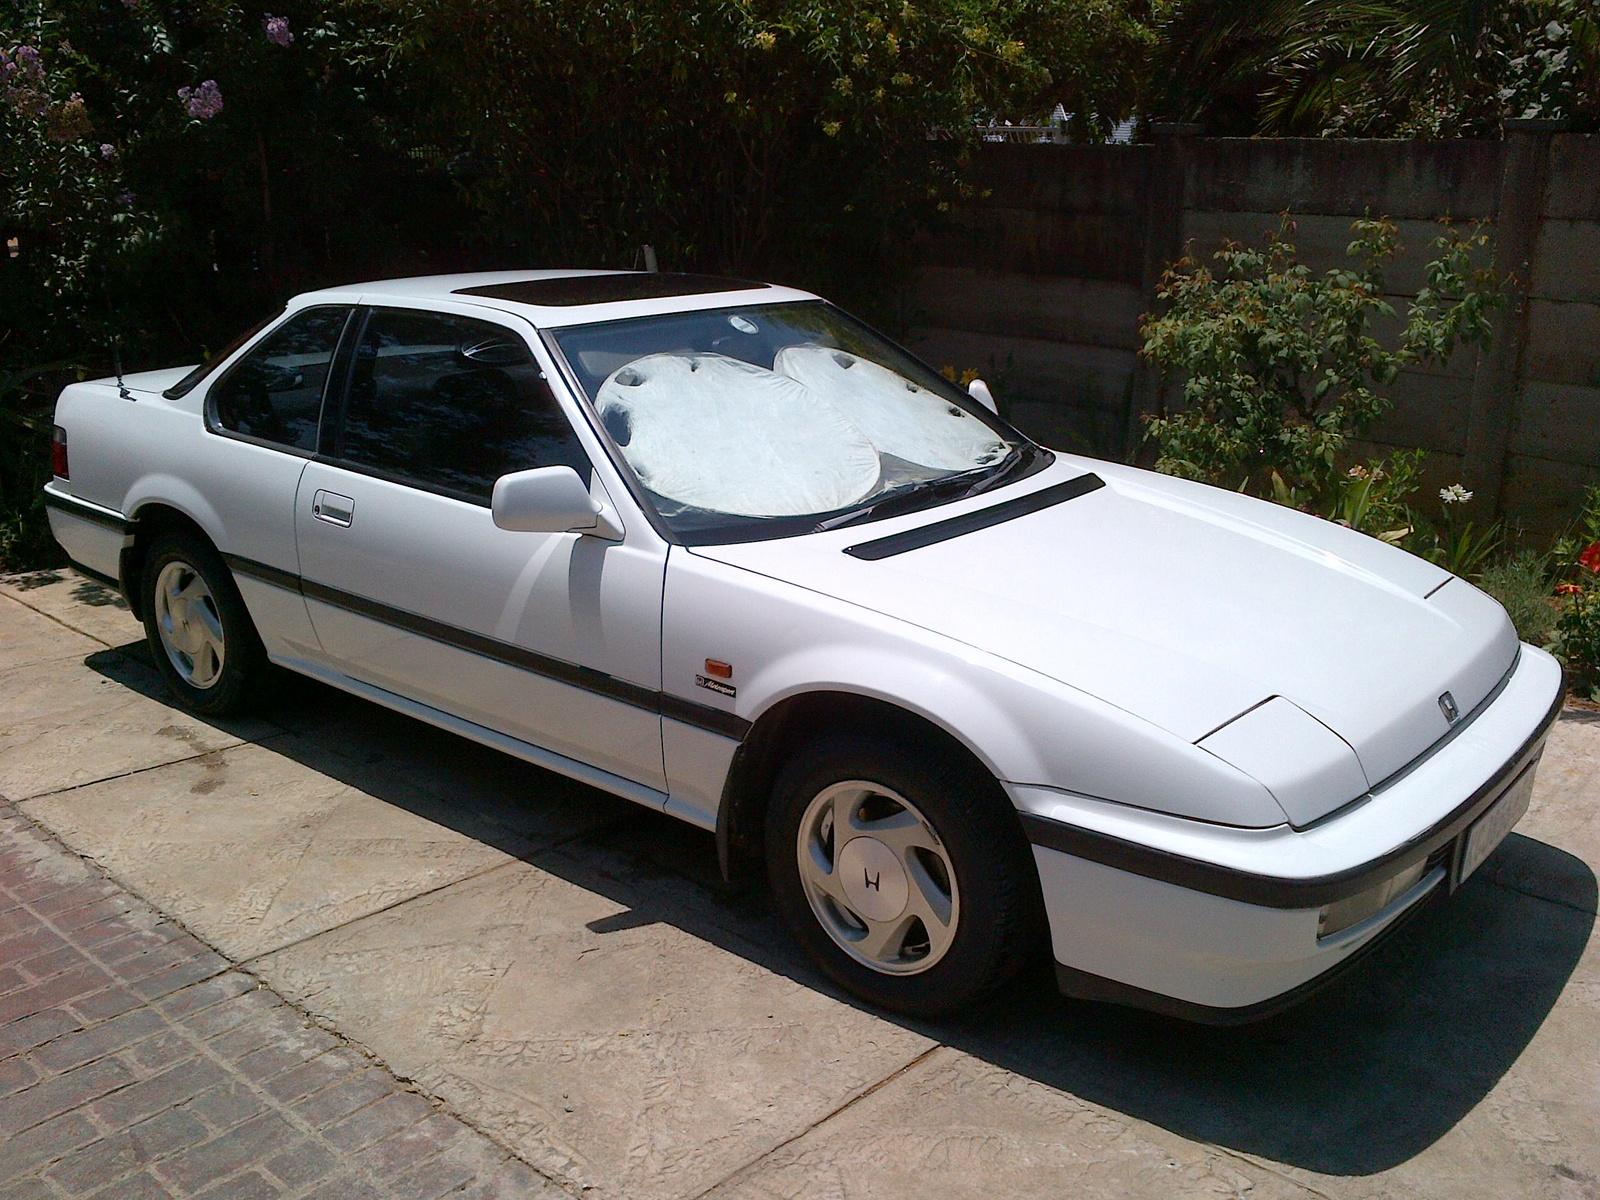 1991_honda_prelude_2_dr_2_0_si_coupe pic 4470467678404236330?interpolation=lanczos noneu0026output quality=85u0026downsize=590 441 honda 1987 honda civic crx 19s 20s car and autos, all makes 1987 Honda CRX HF at fashall.co